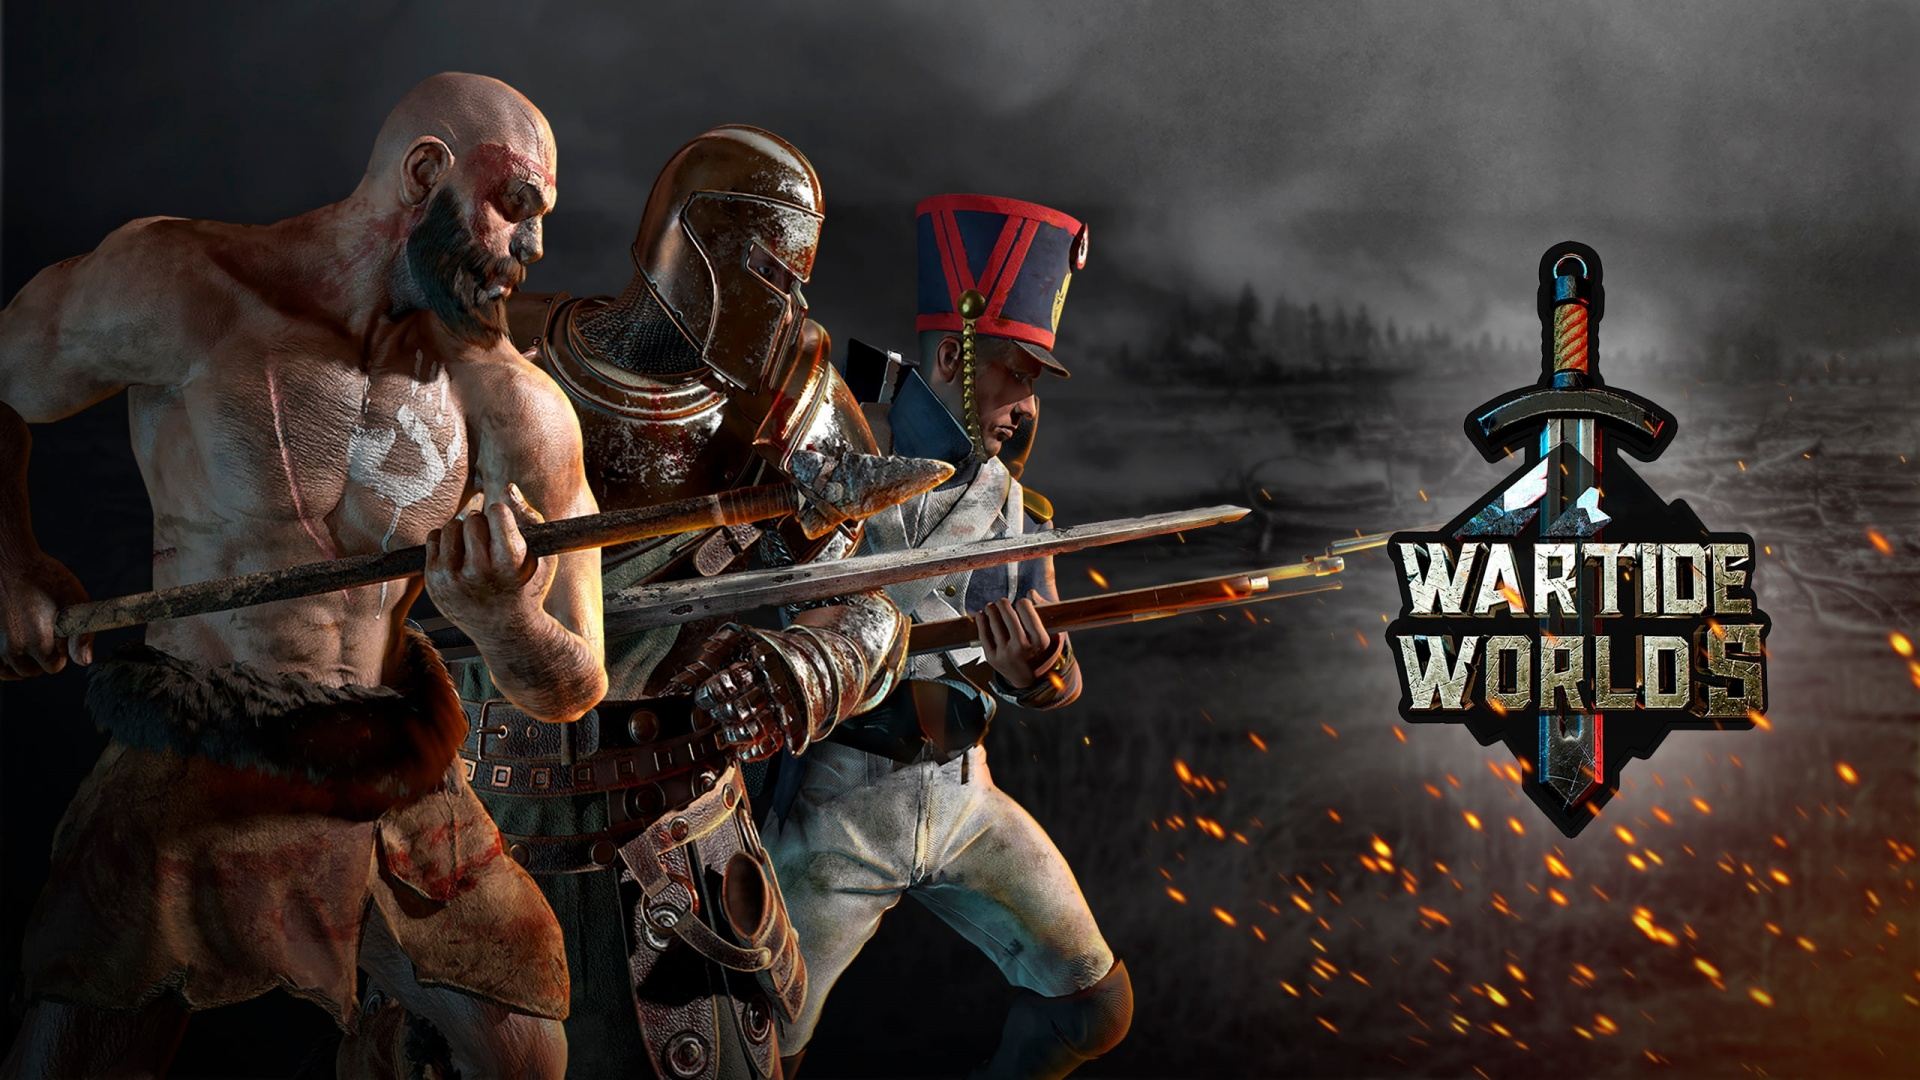 На Kickstarter собирают деньги на гибрид MMO, RTS и FPS под названием Wartide Worlds